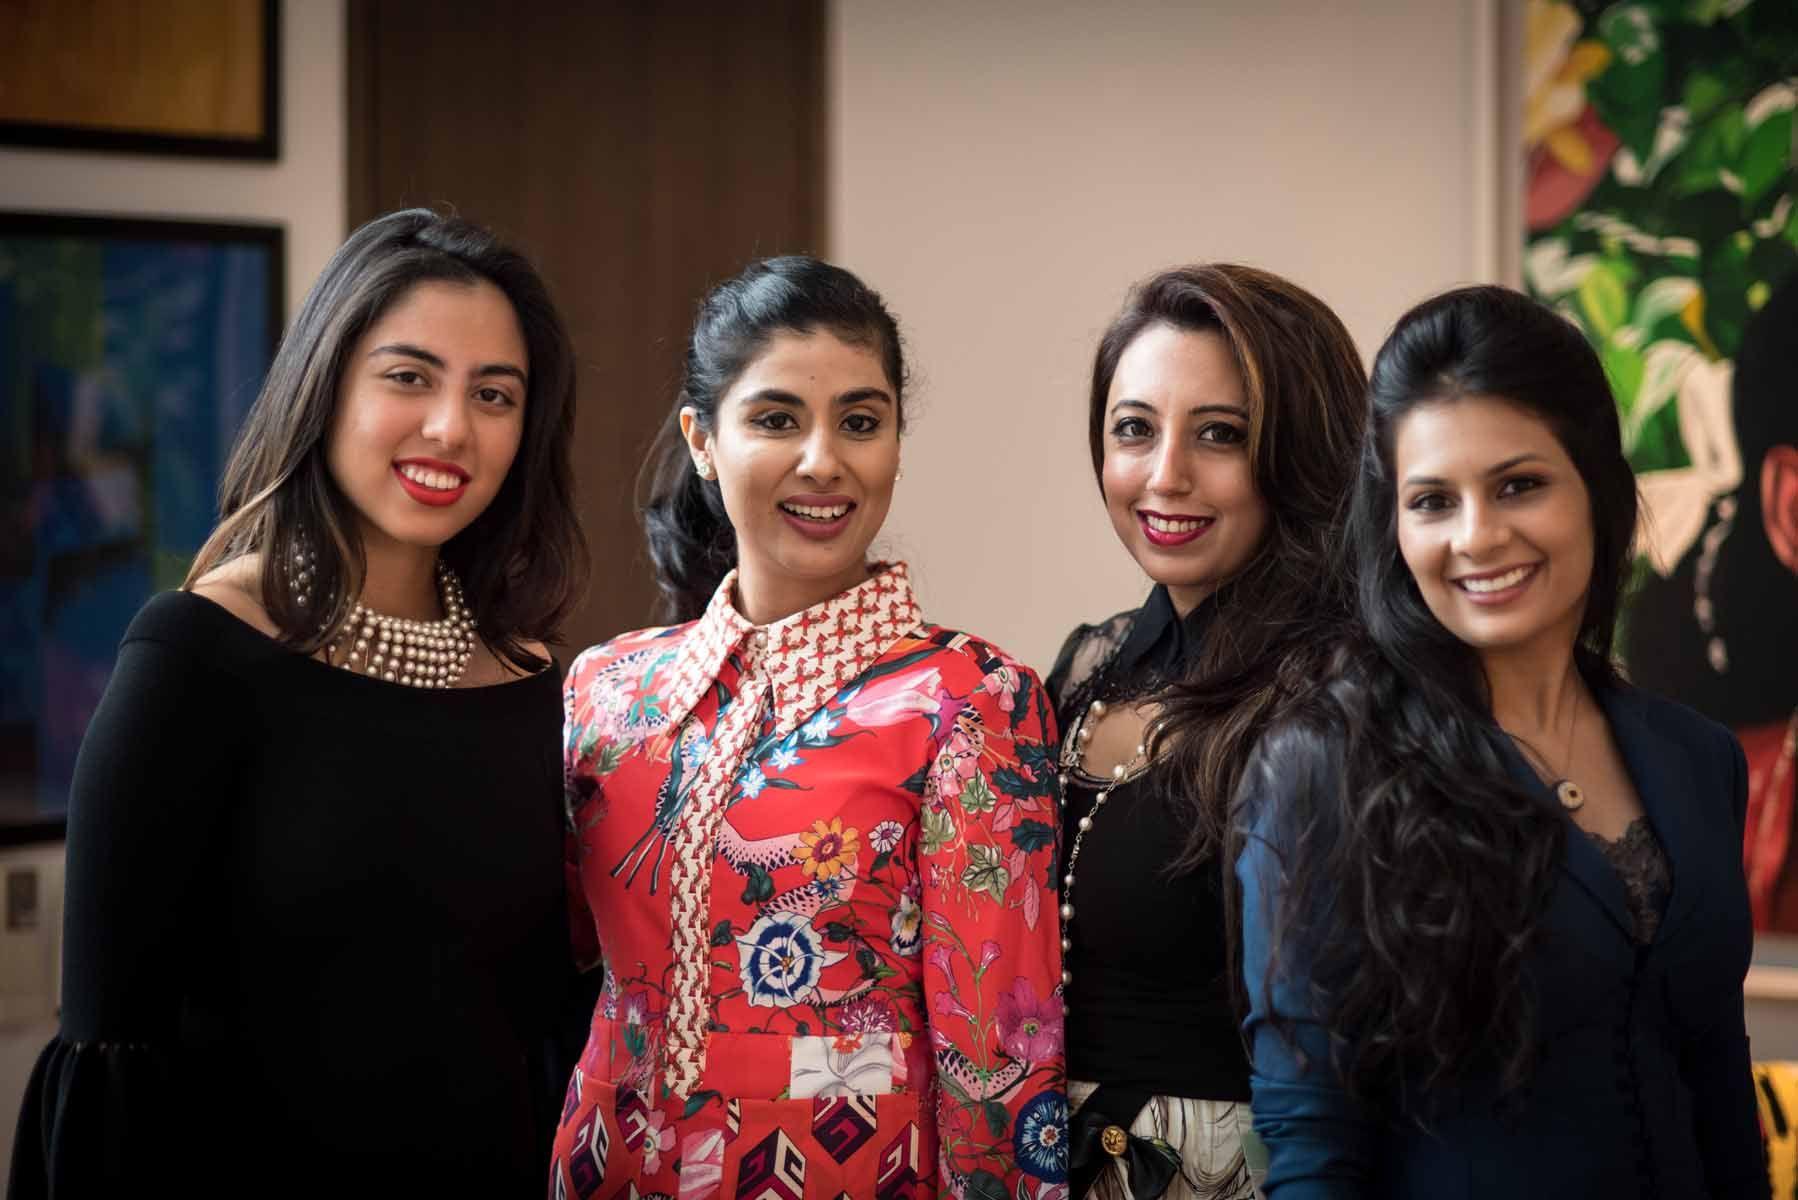 Shaila Hiranandani, Nayantara Dhillon, Dimple Aswani, Prerna Jhunjhunwala